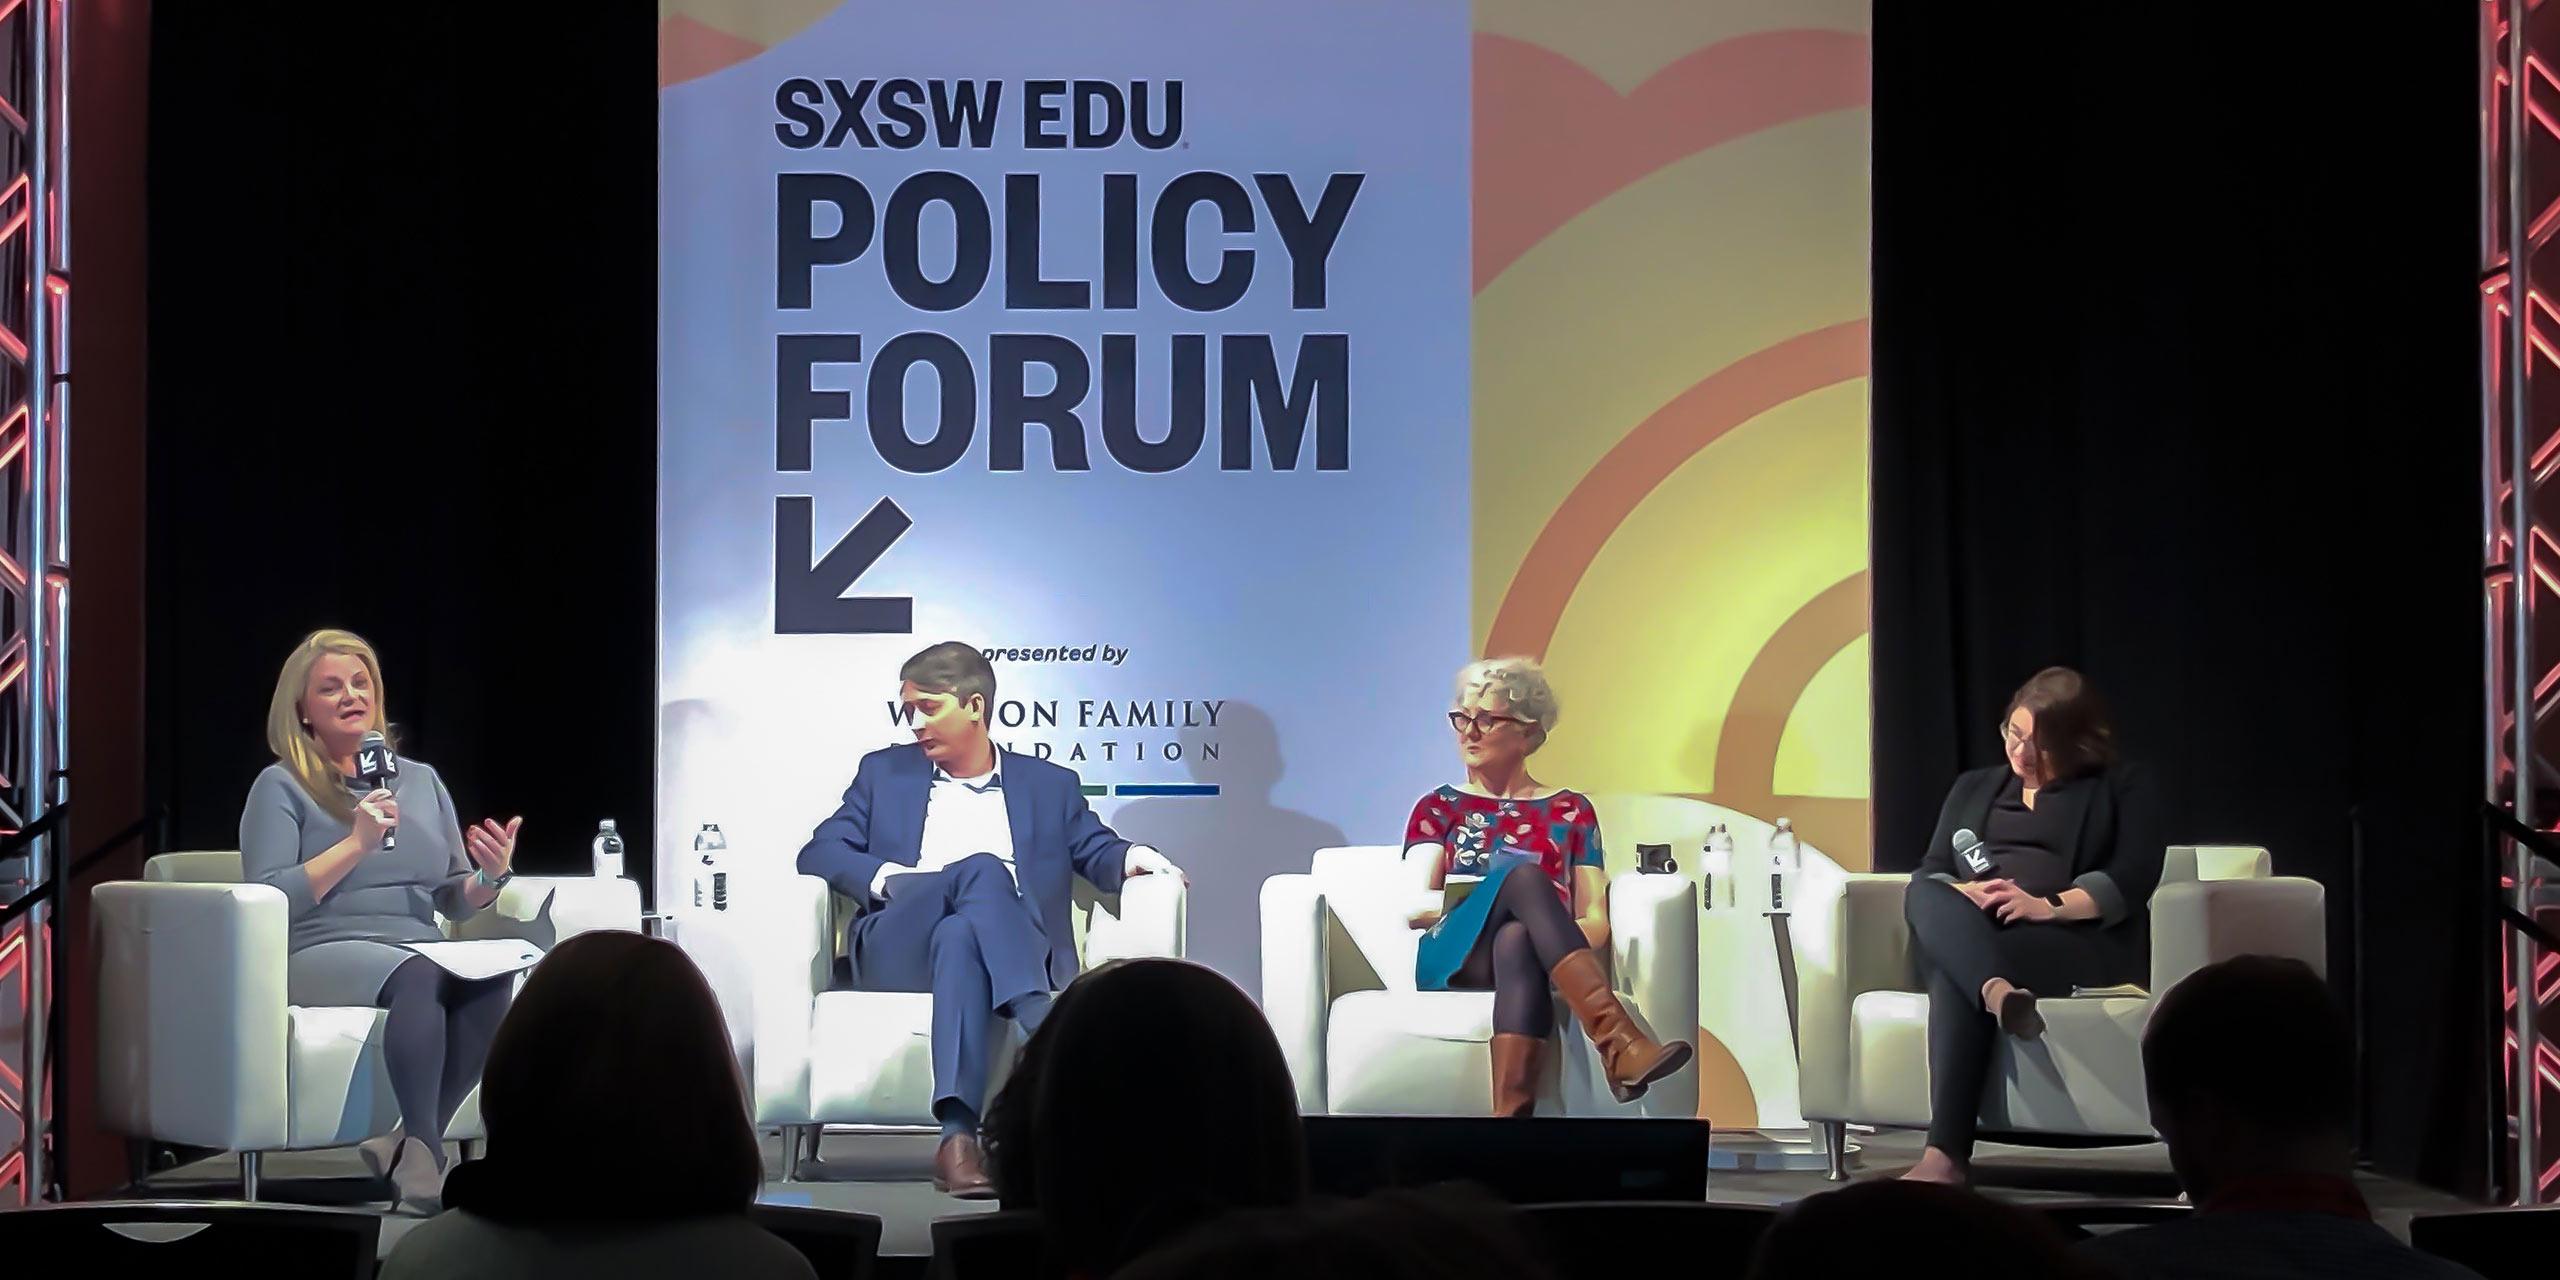 SXSW EDU 2019: 4 Key Takeaways About Education Technology